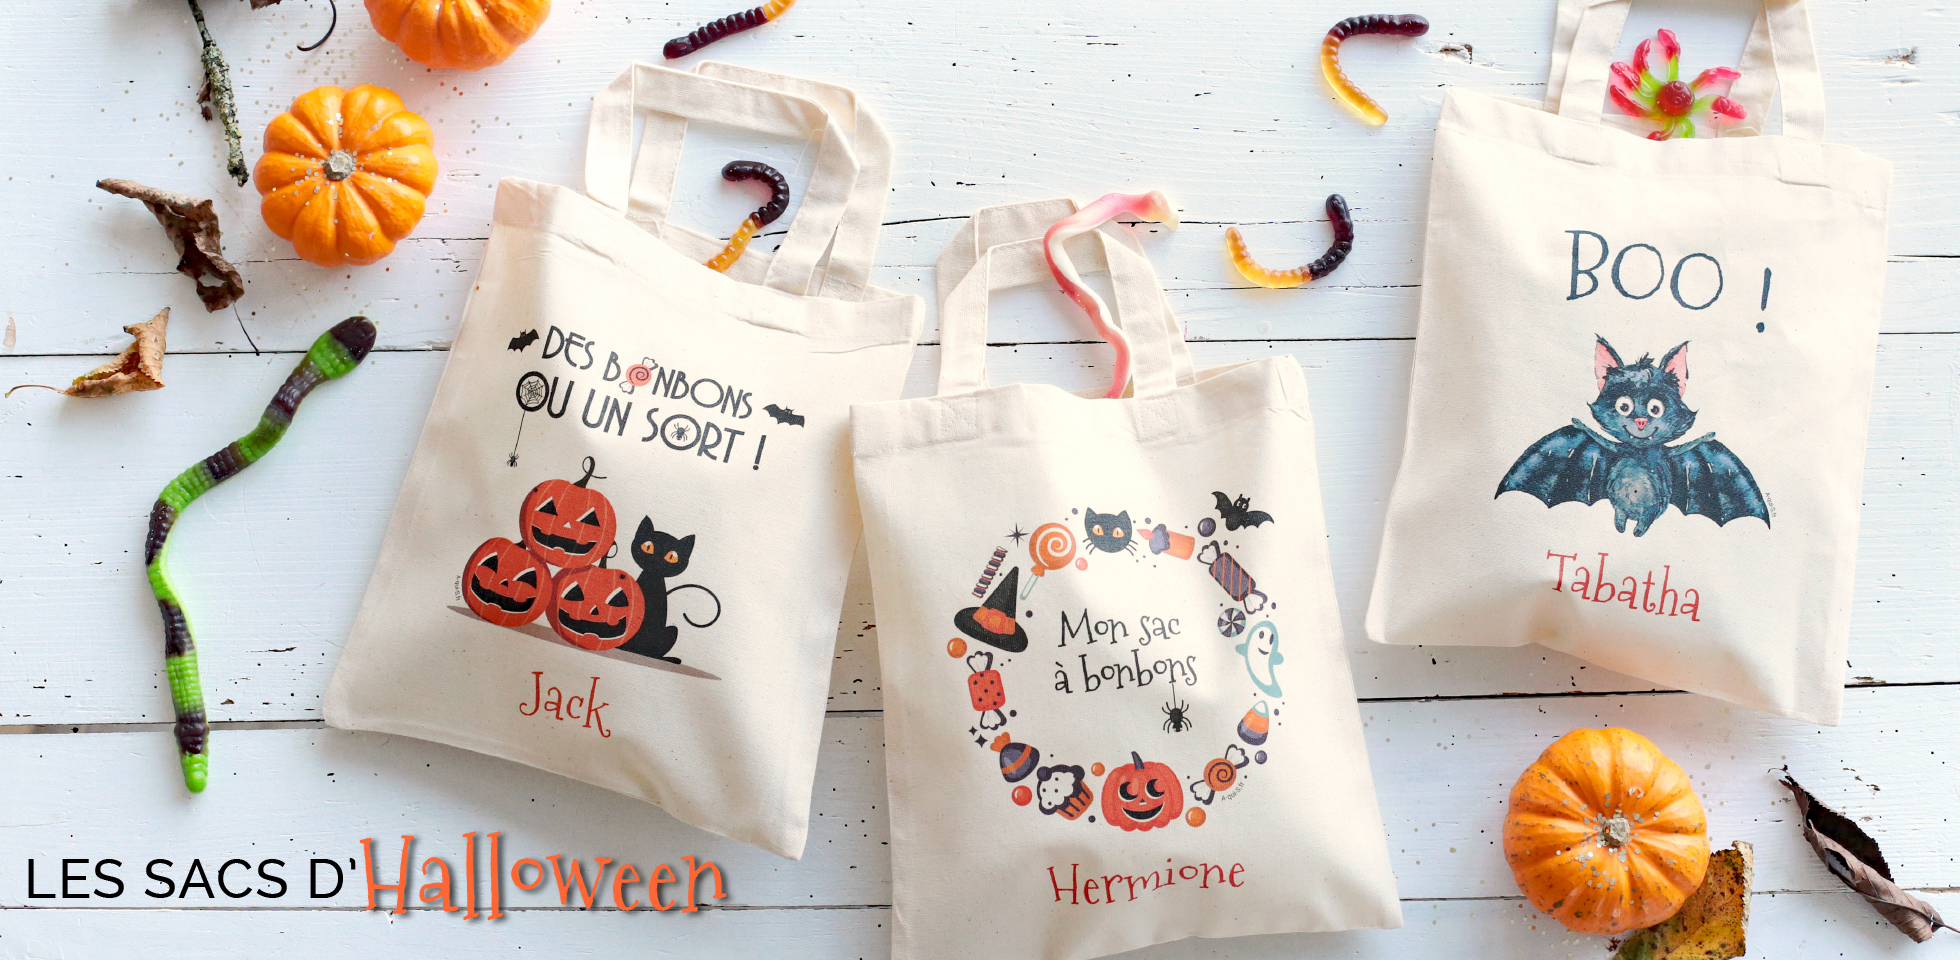 Les sacs d'Halloween